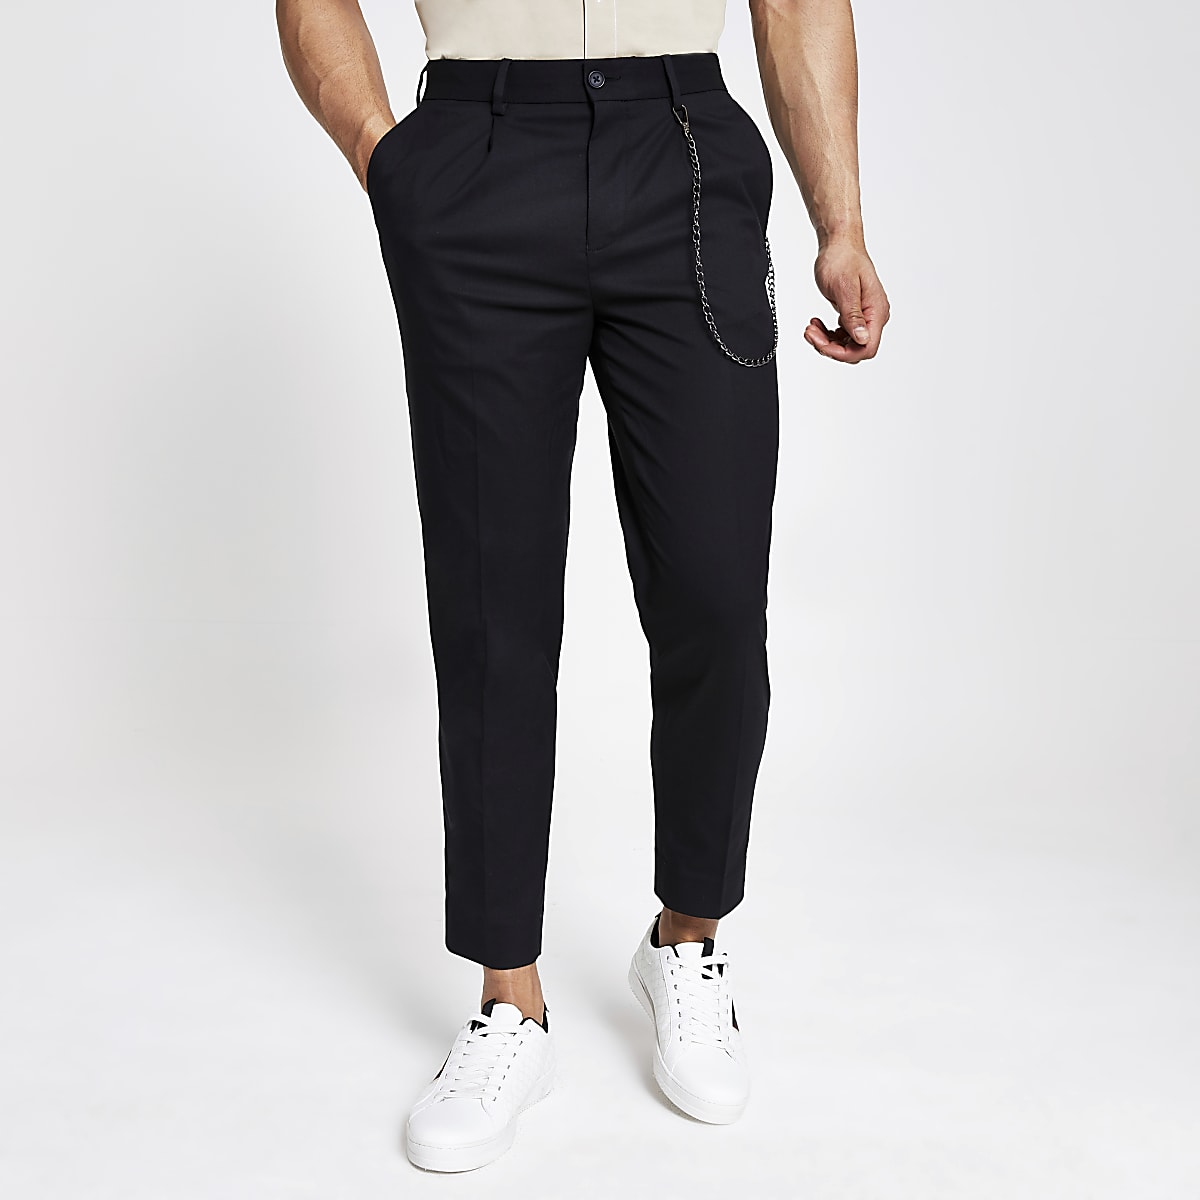 Black skinny tapered pants